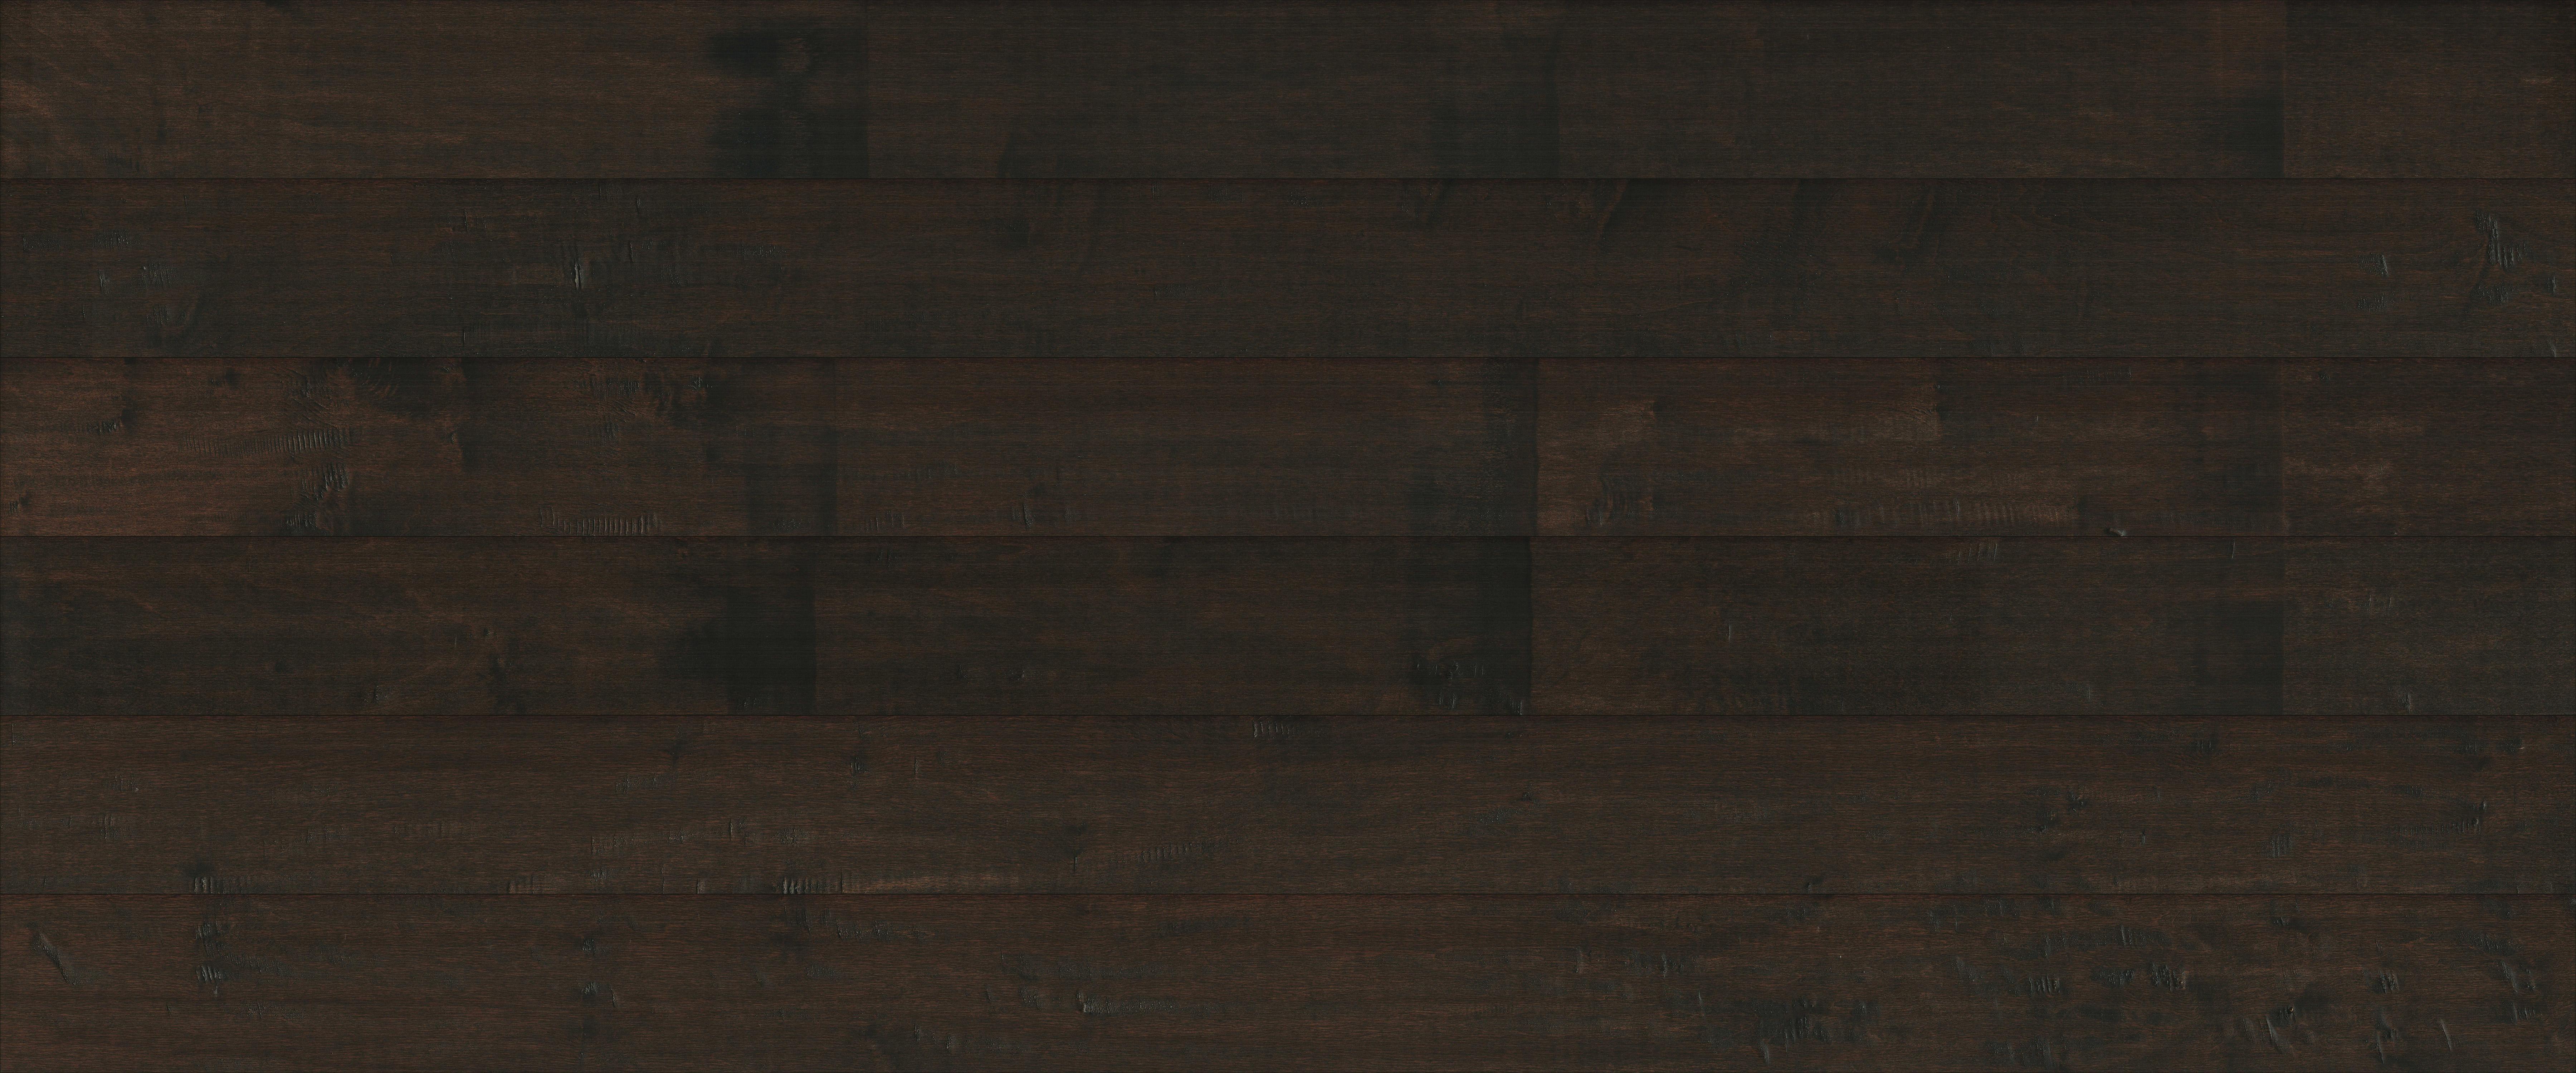 maple espresso hardwood flooring of 18 luxury laminate vs engineered hardwood pics dizpos com inside laminate vs engineered hardwood fresh mullican san marco sculpted maple dark mocha 5 engineered hardwood